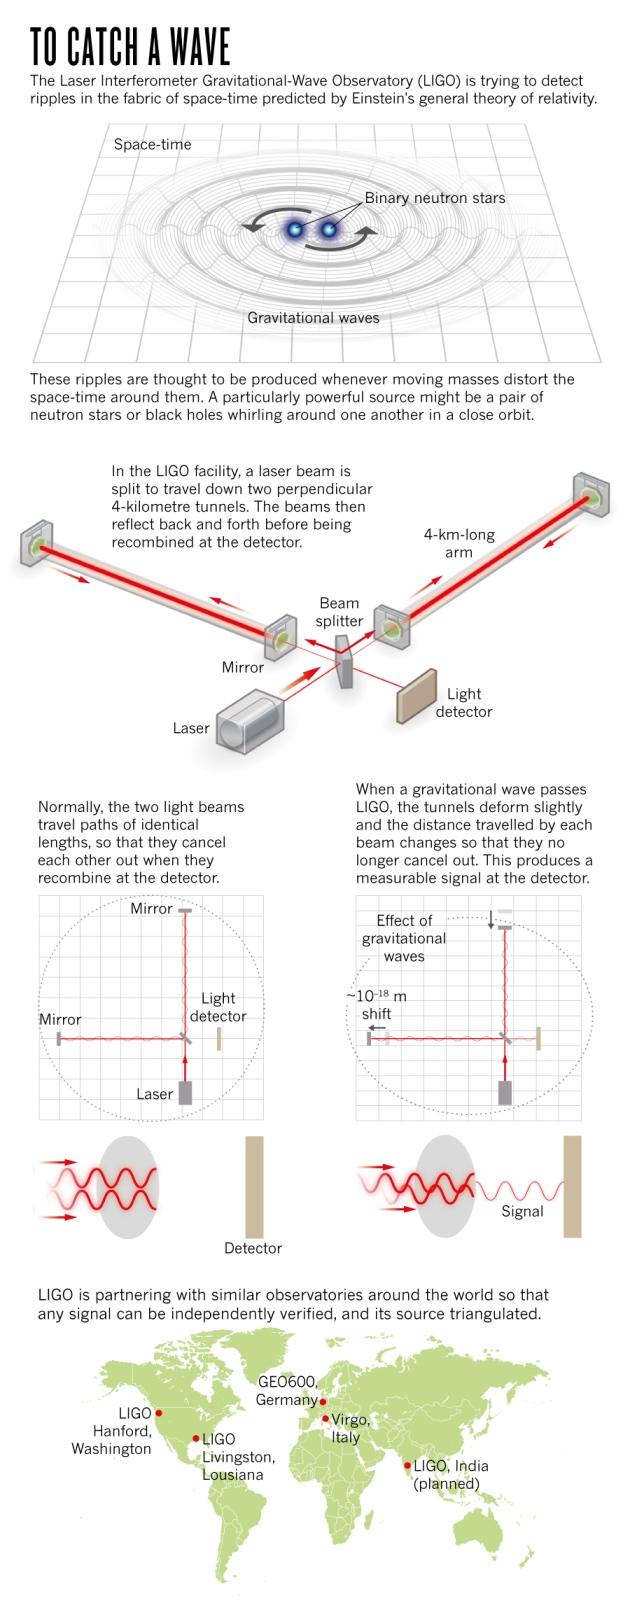 Princip detekce gravitaÄŤnĂch vln.  Kredit: Nik Spencer/Nature